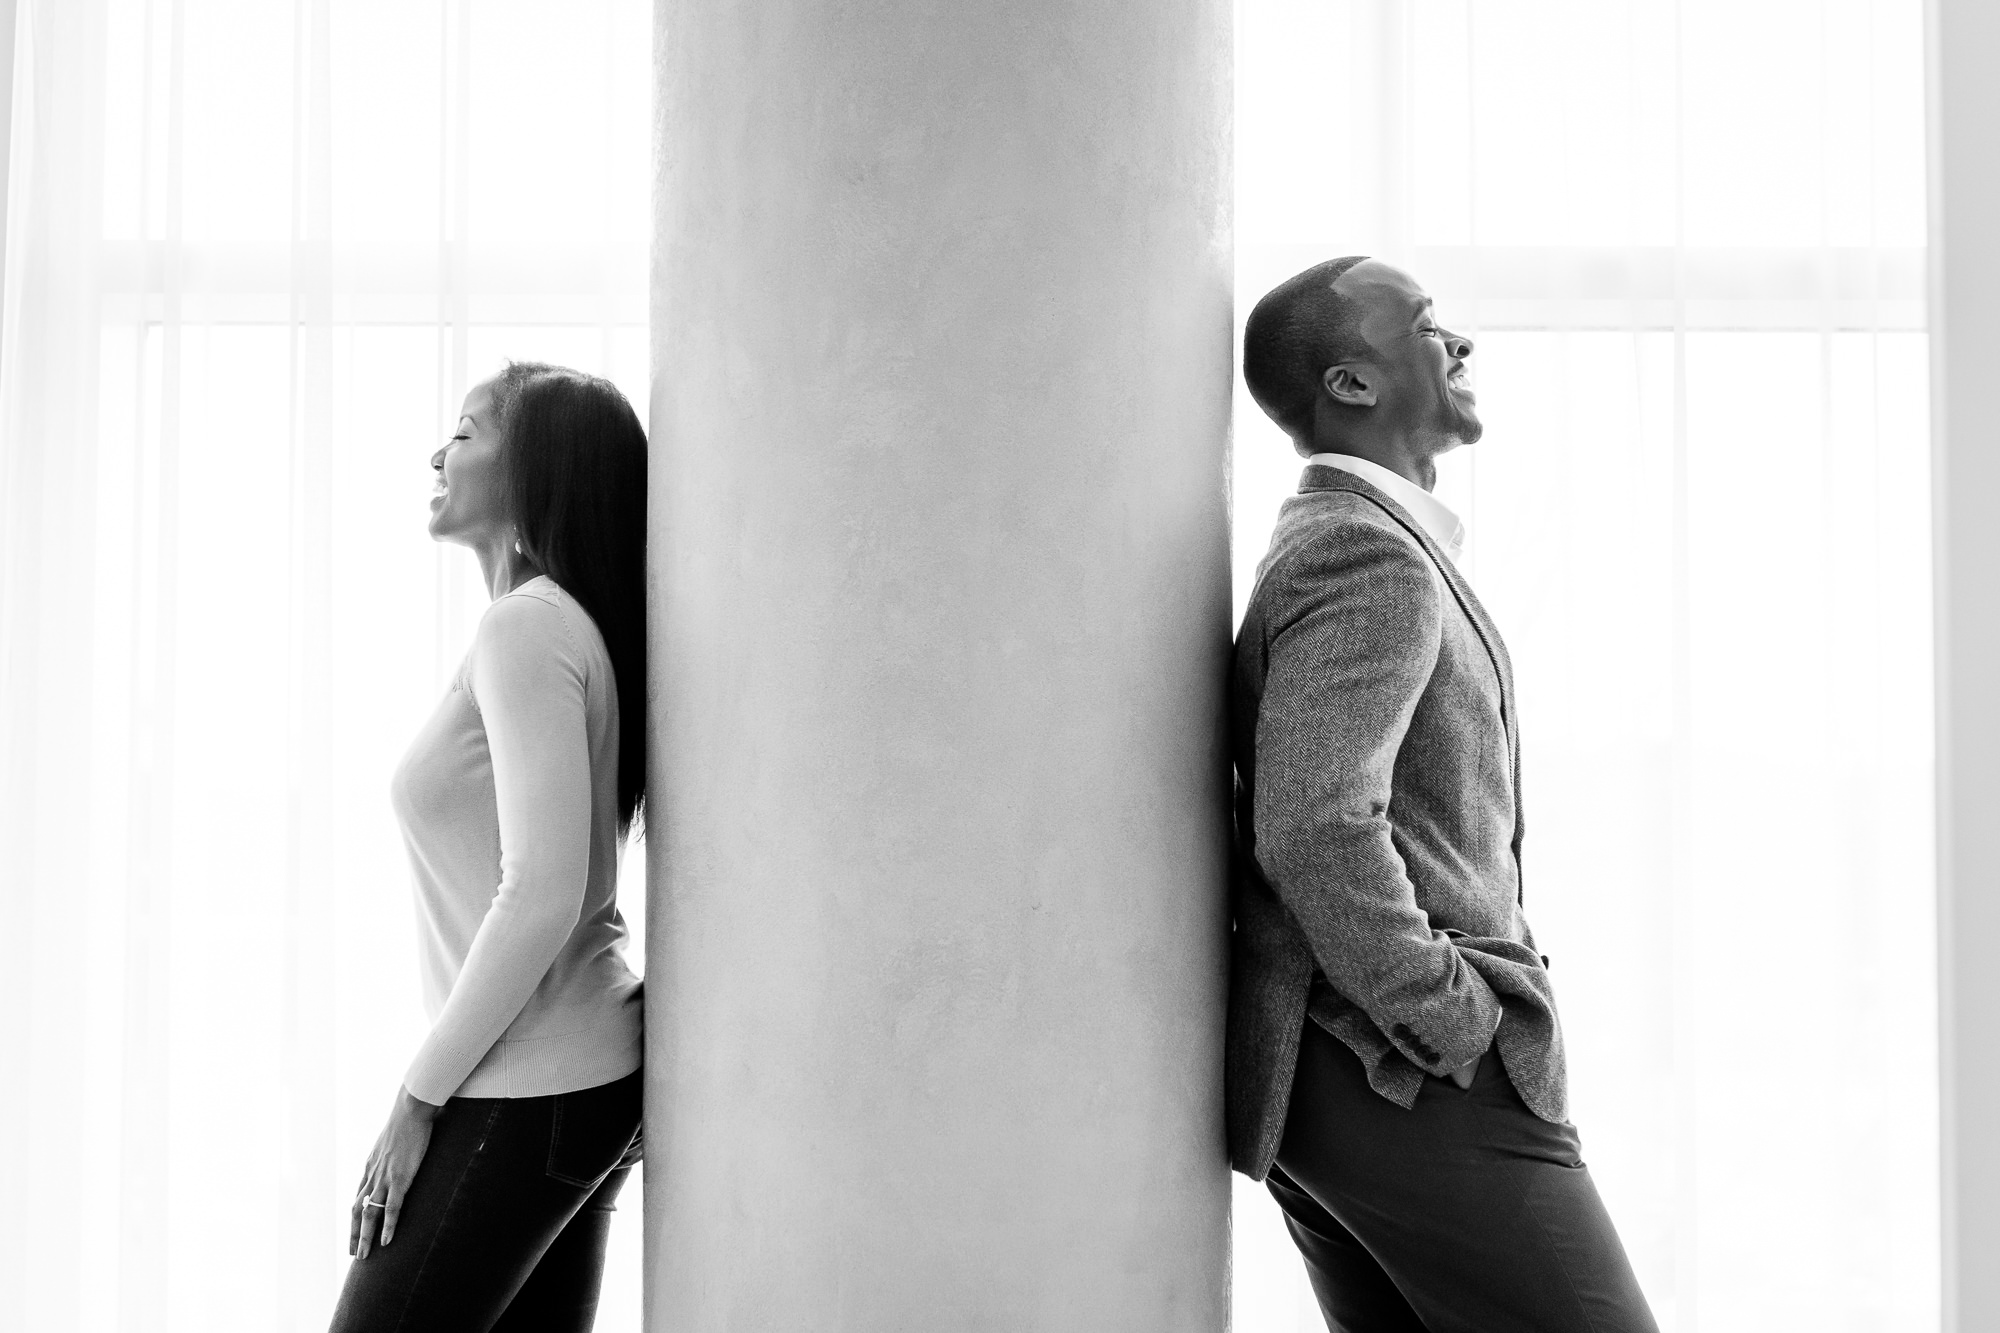 019-christopher-jason-studios-washington-dc-wharf-engagement-session-nigerian-couple-laughs-together-2.jpg